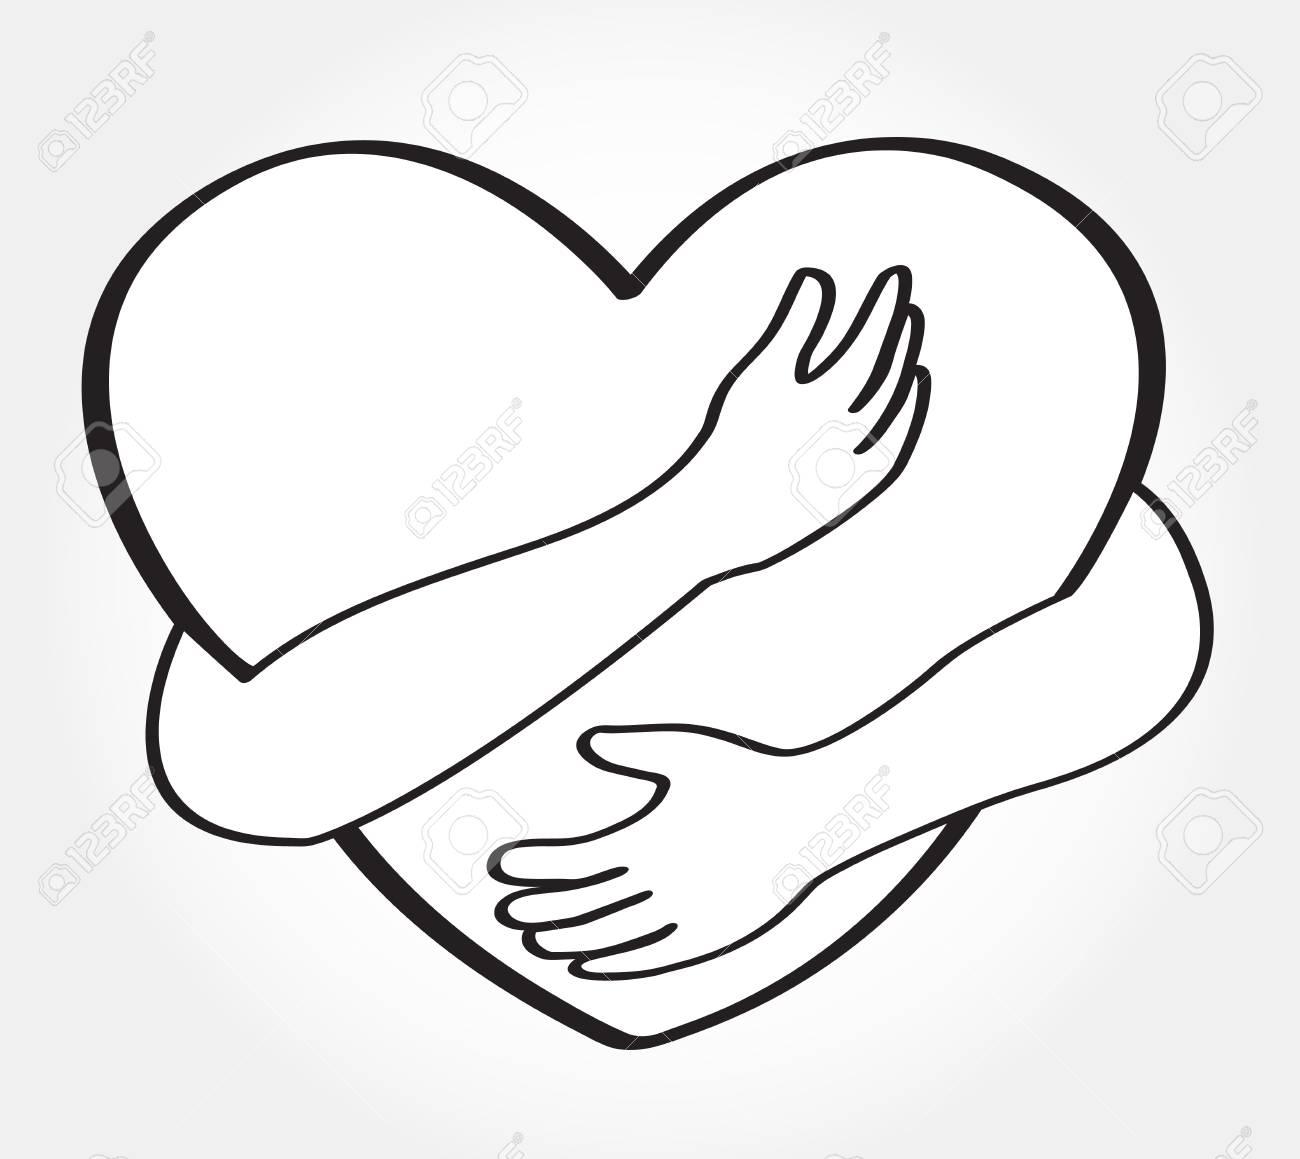 Hugging heart vector , hug yourself , love yourself.